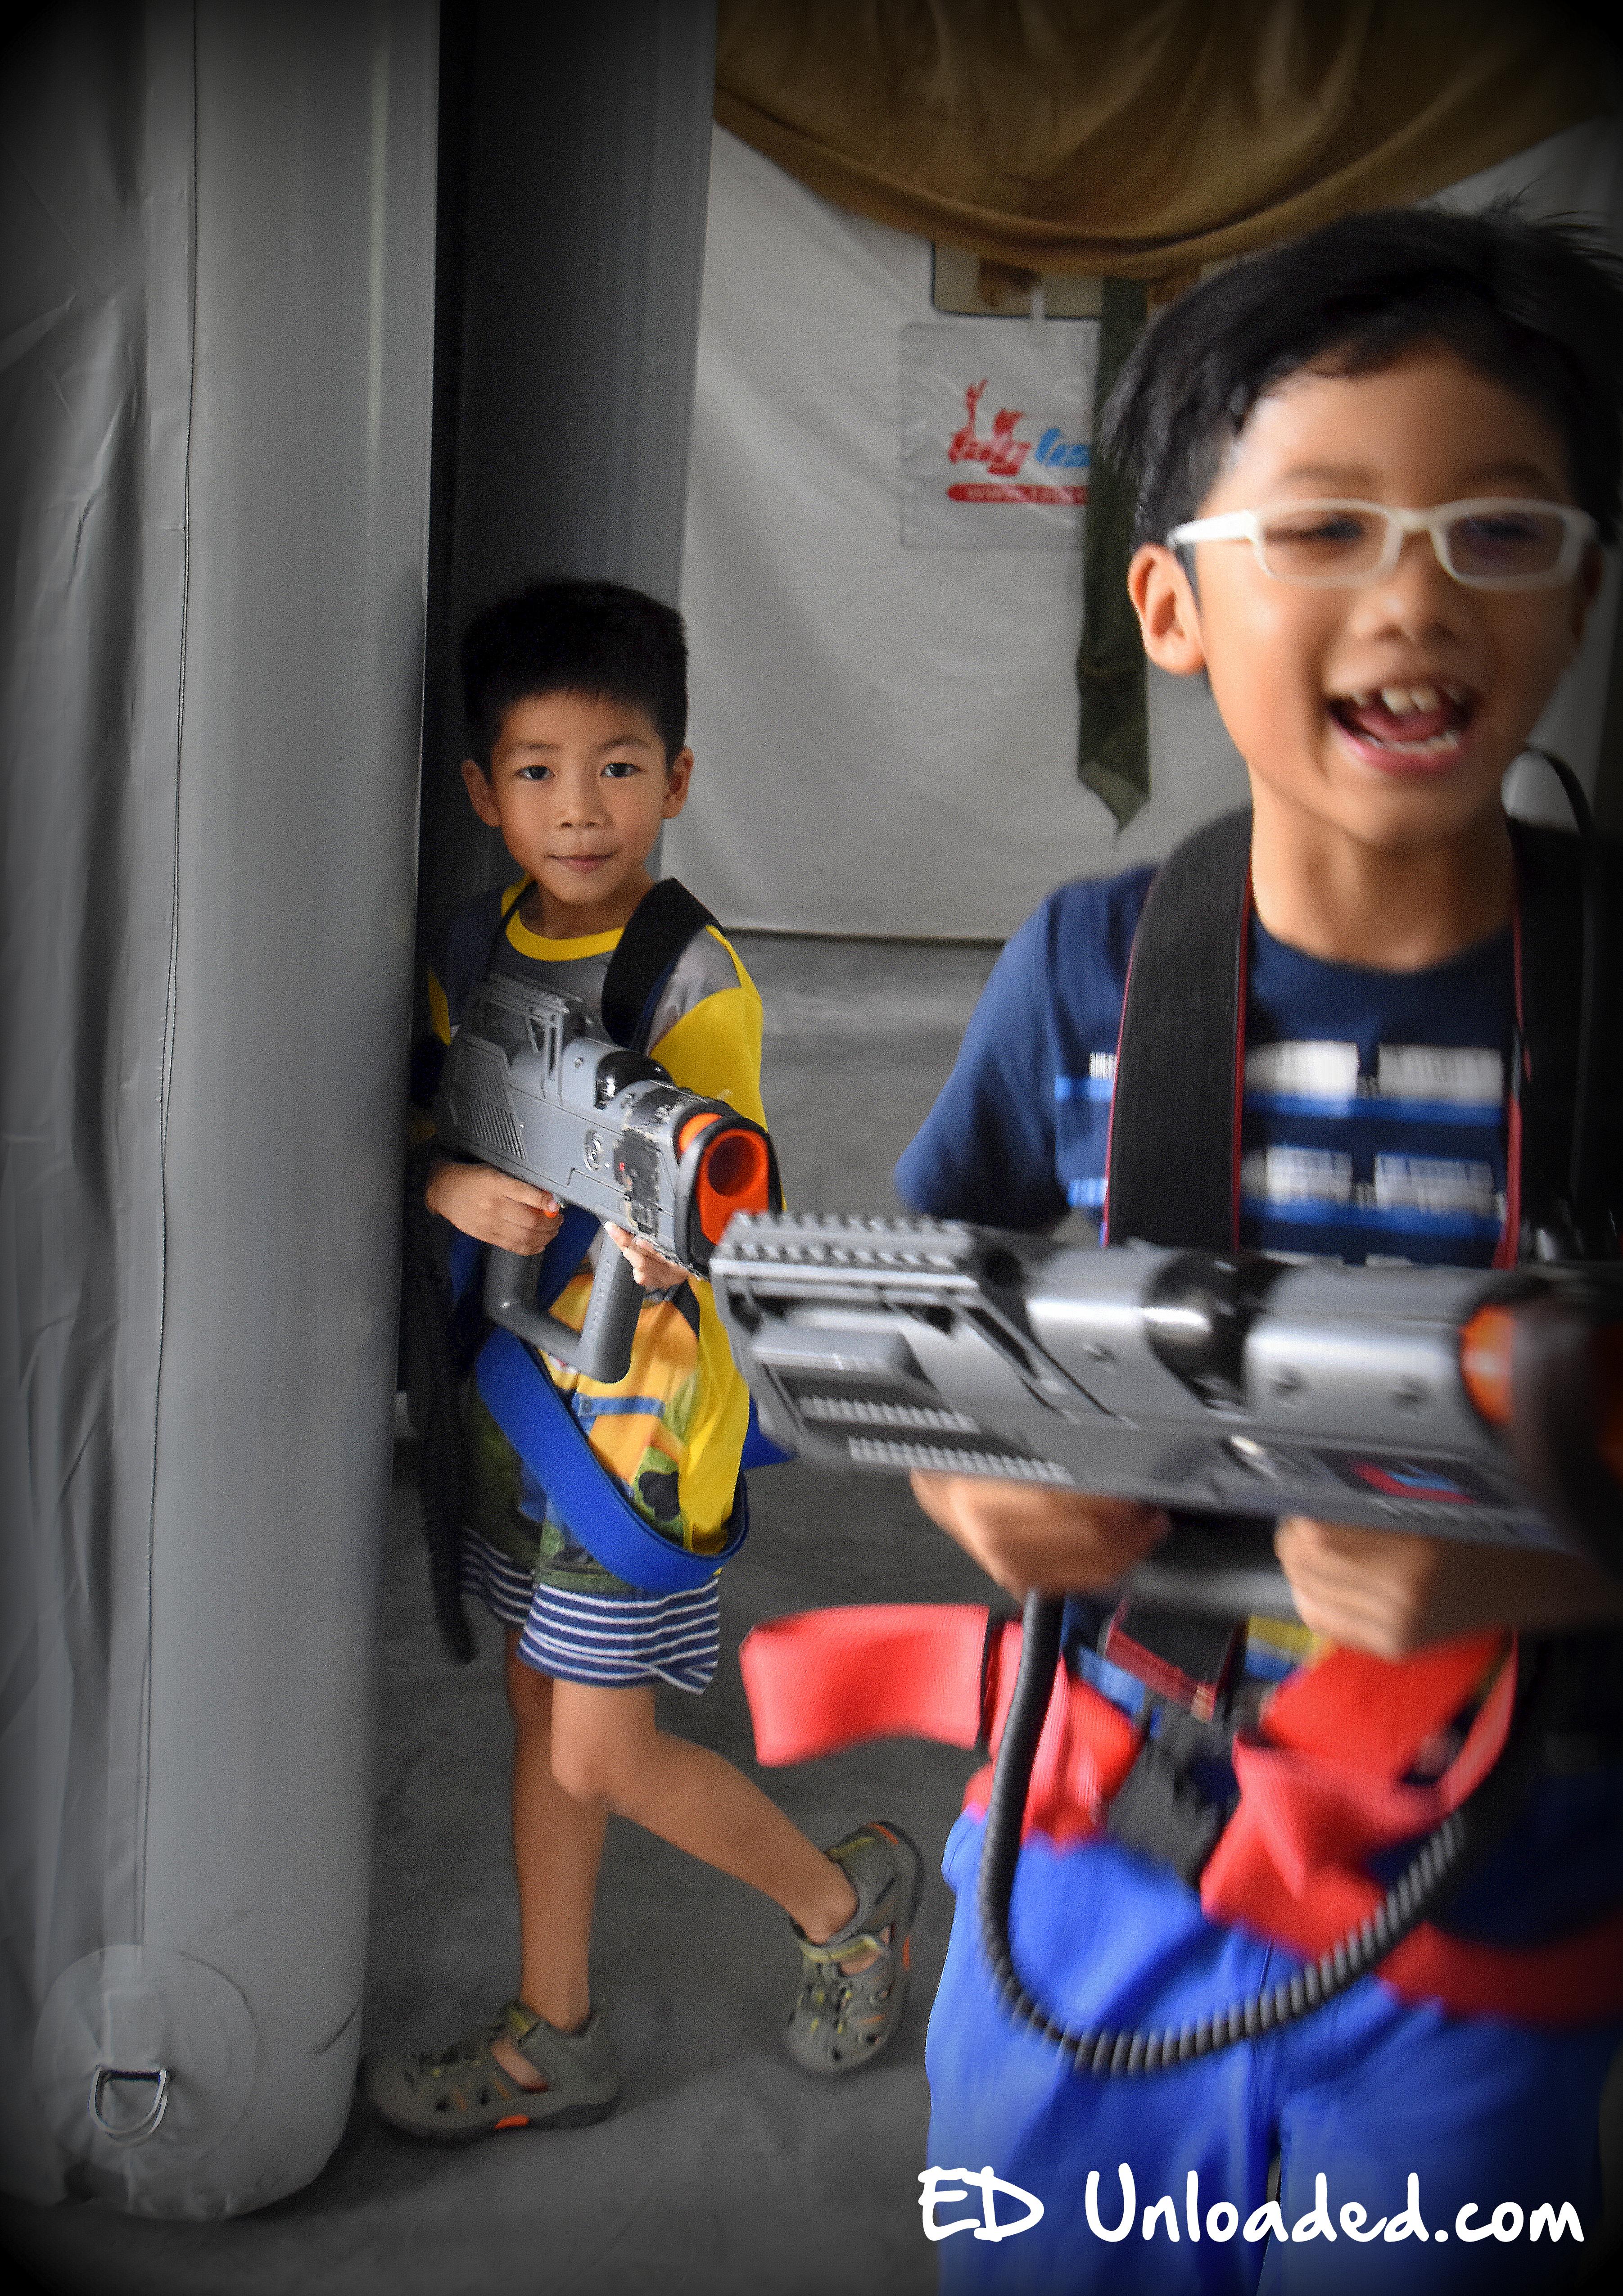 Laser Tag At Tagteam Inc  - Ed Unloaded com | Parenting, Lifestyle